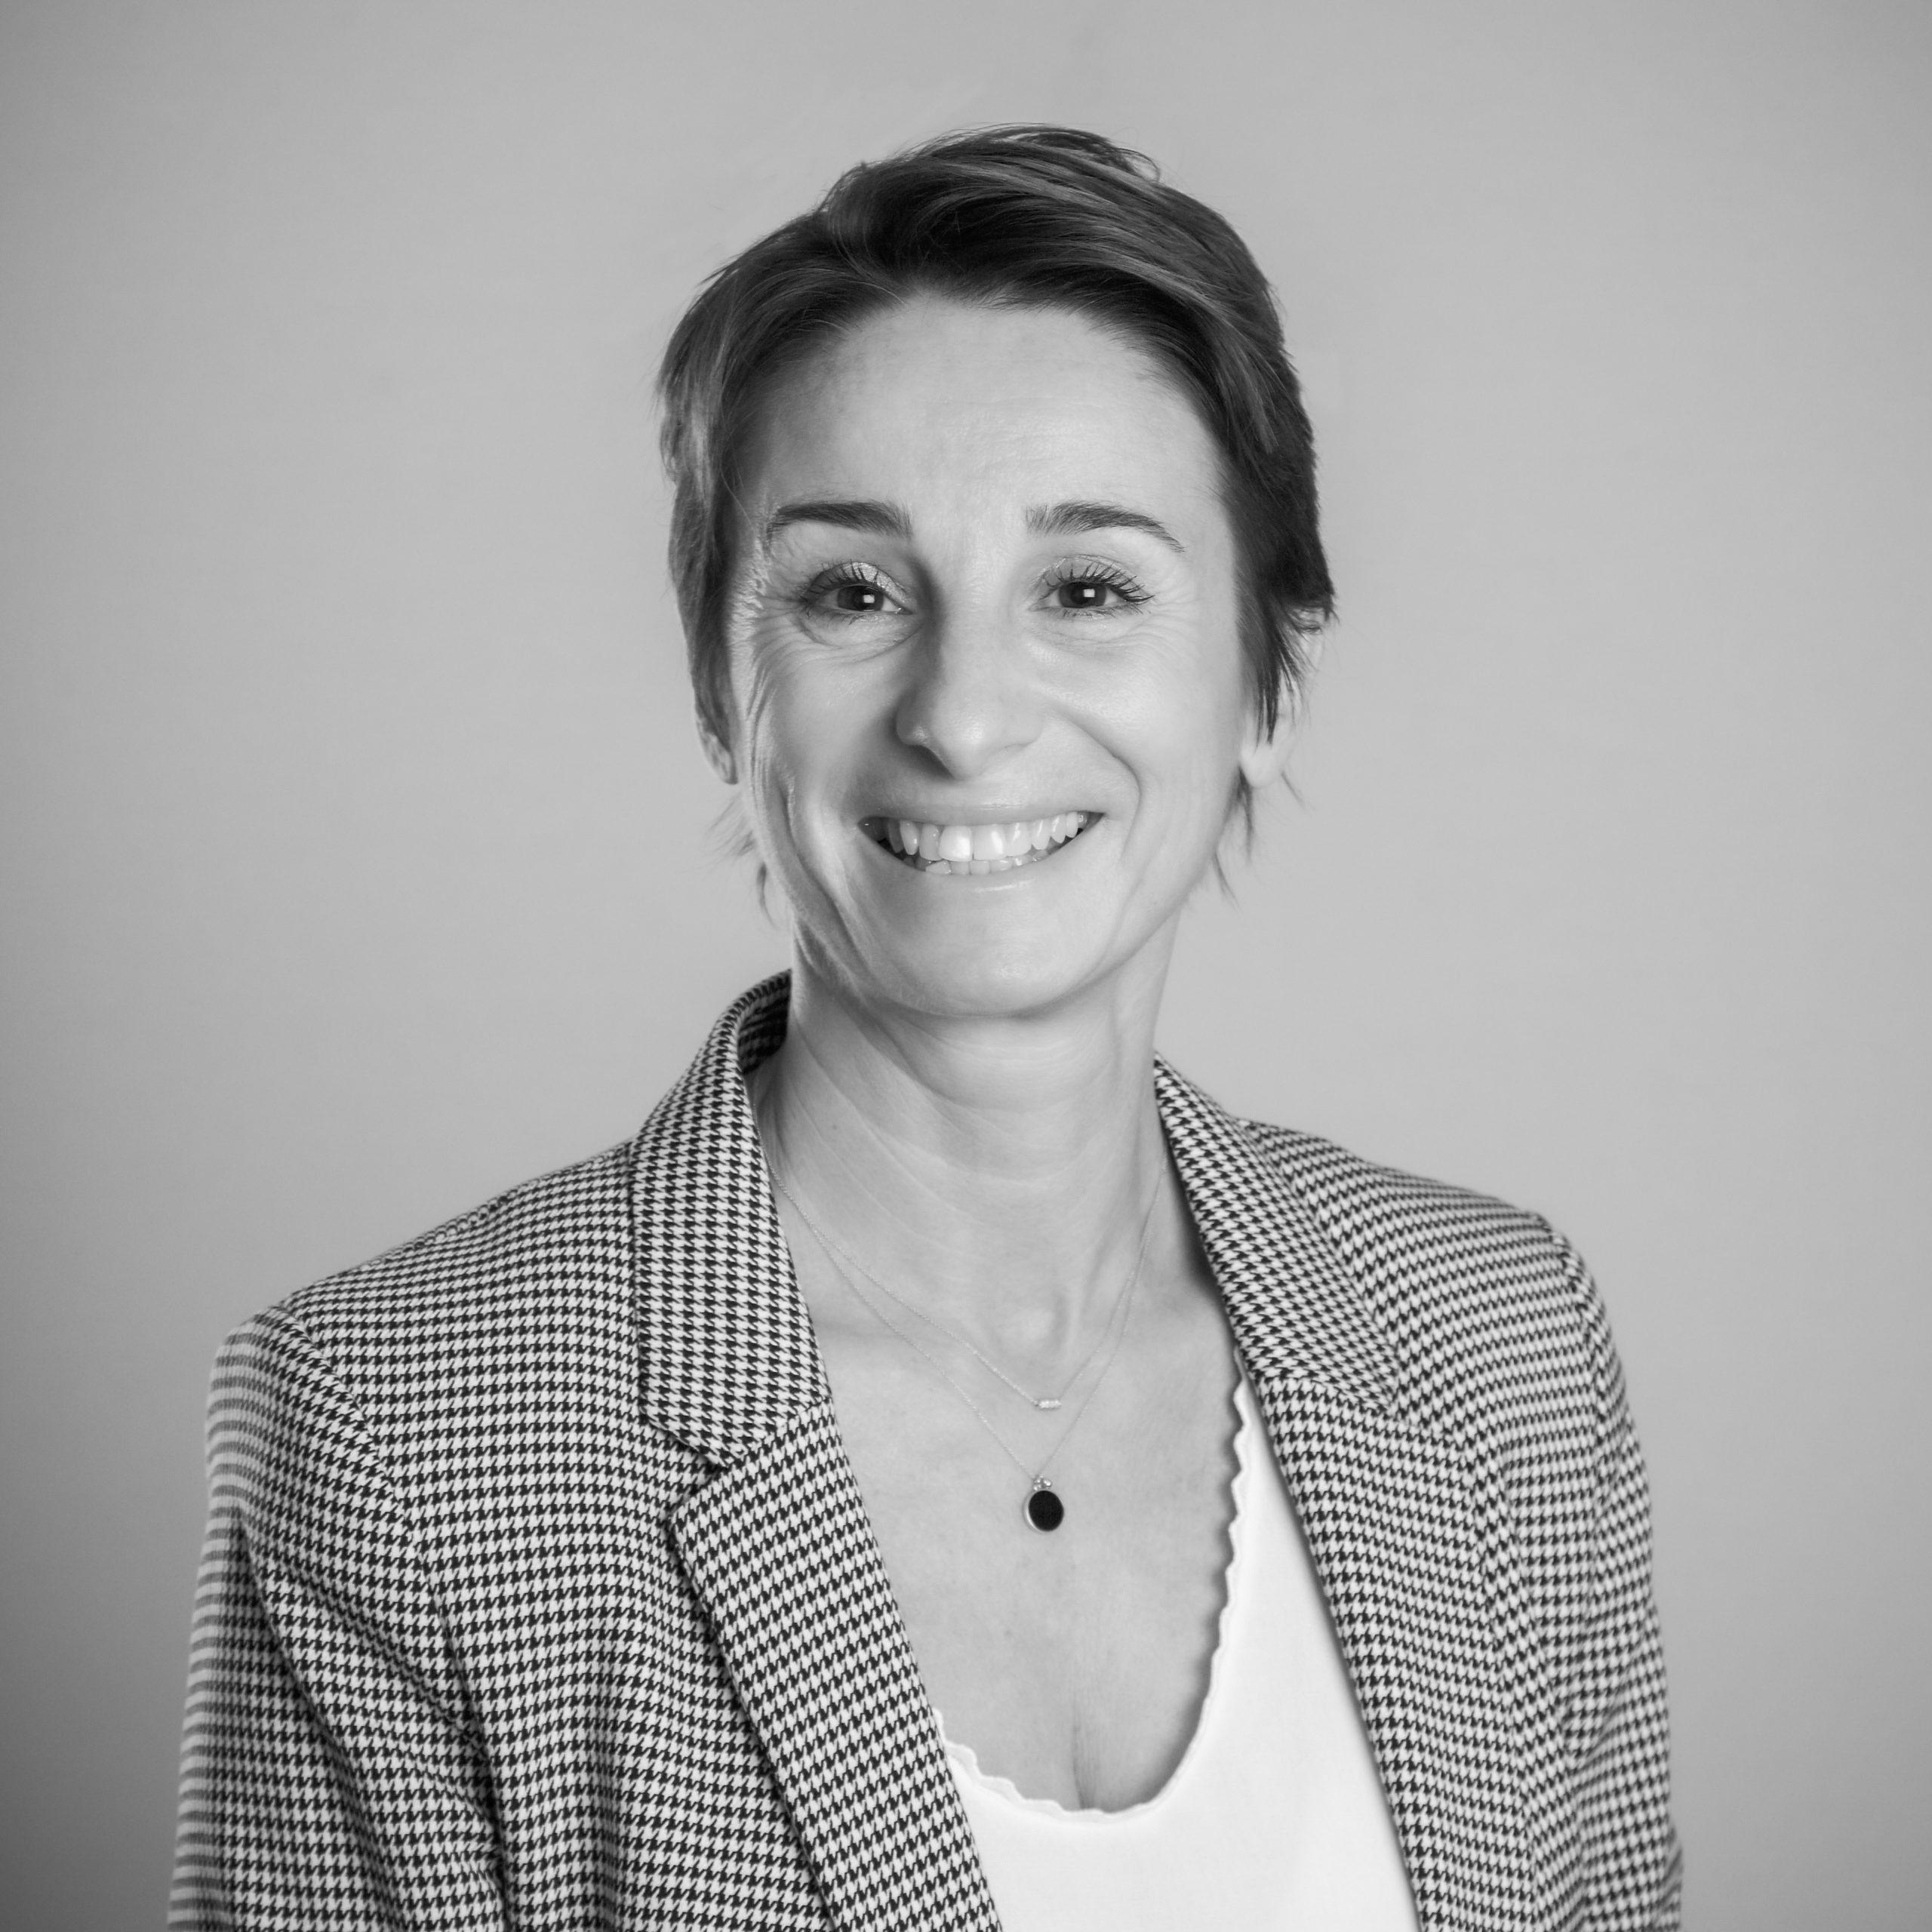 Géraldine Barthe-Pouget